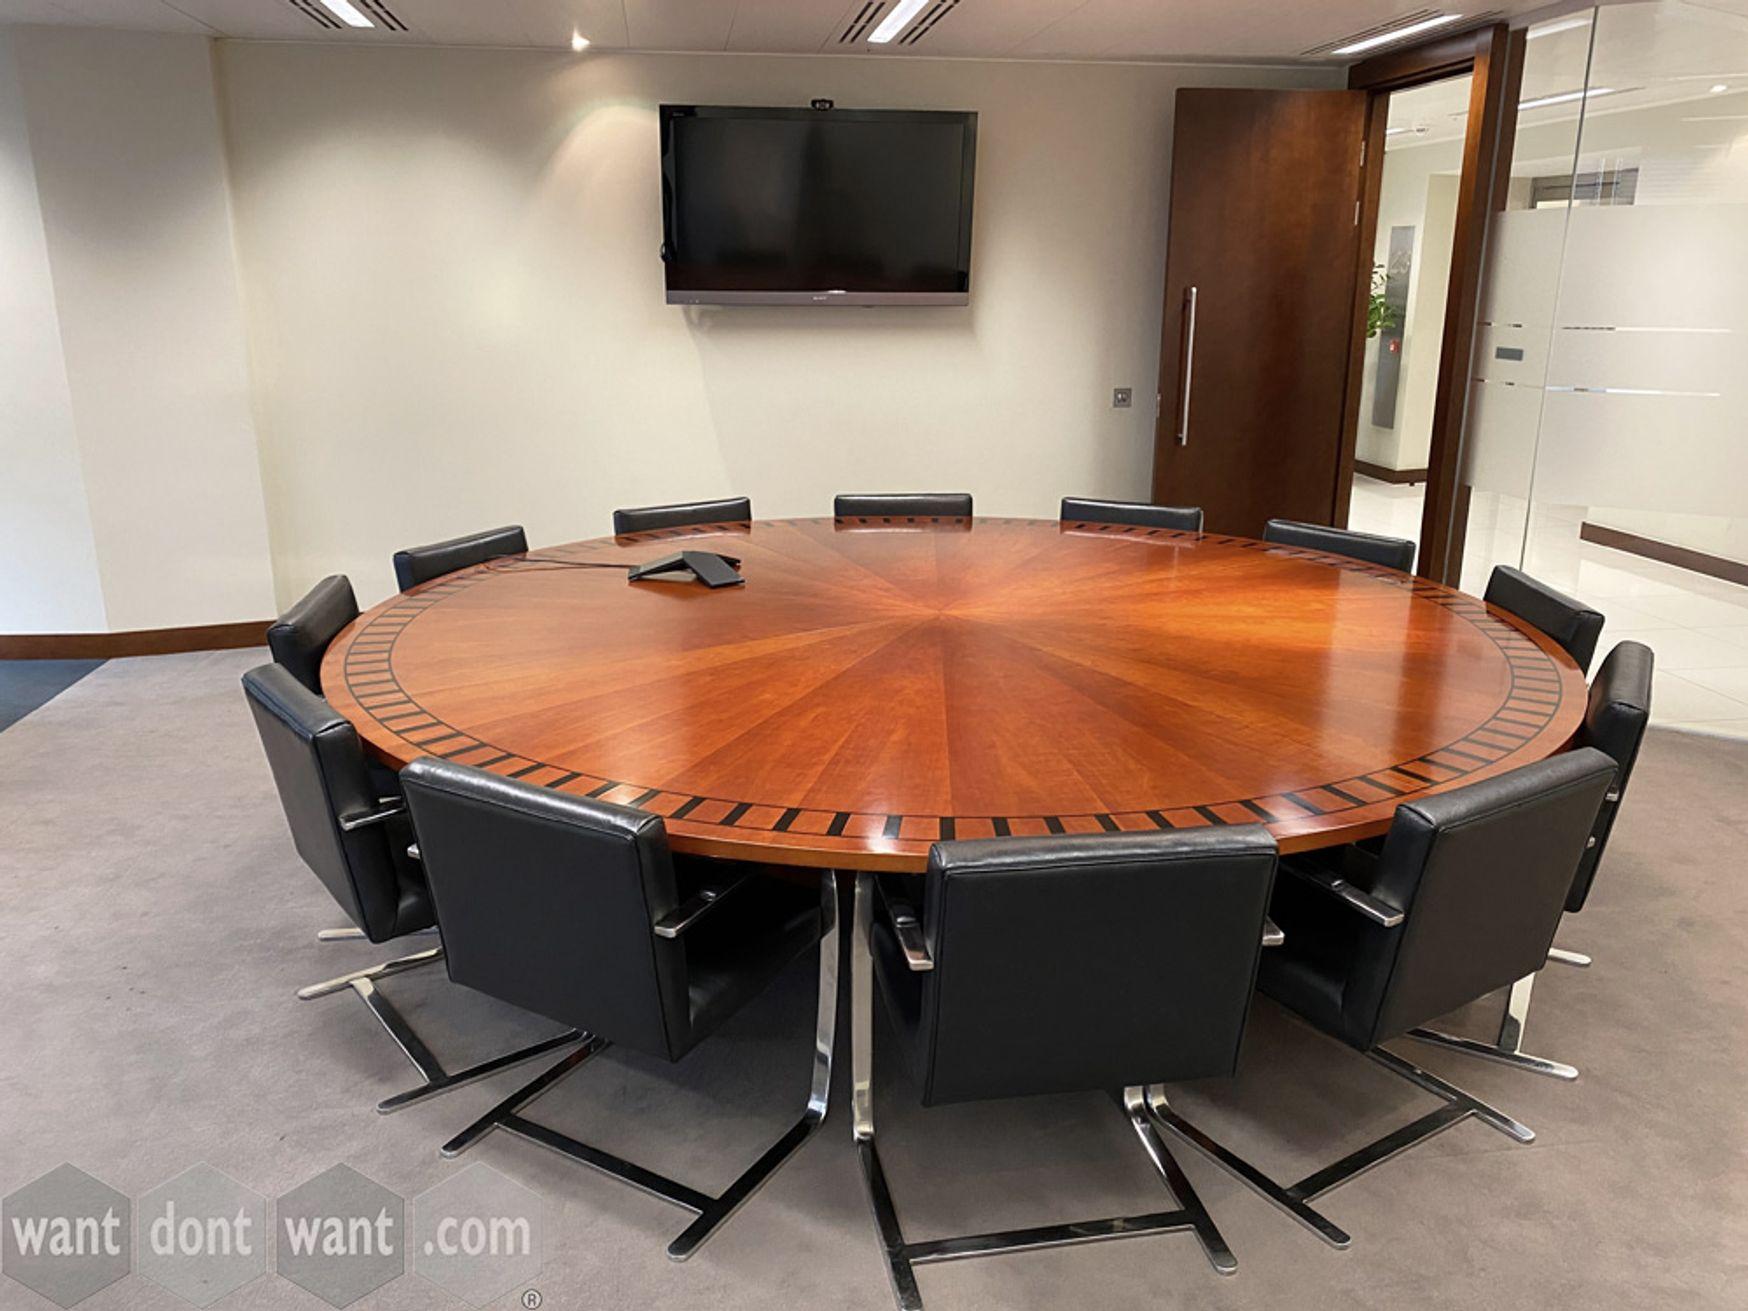 A magnificent circular boardroom table in cherry radial veneer with ebony inlay